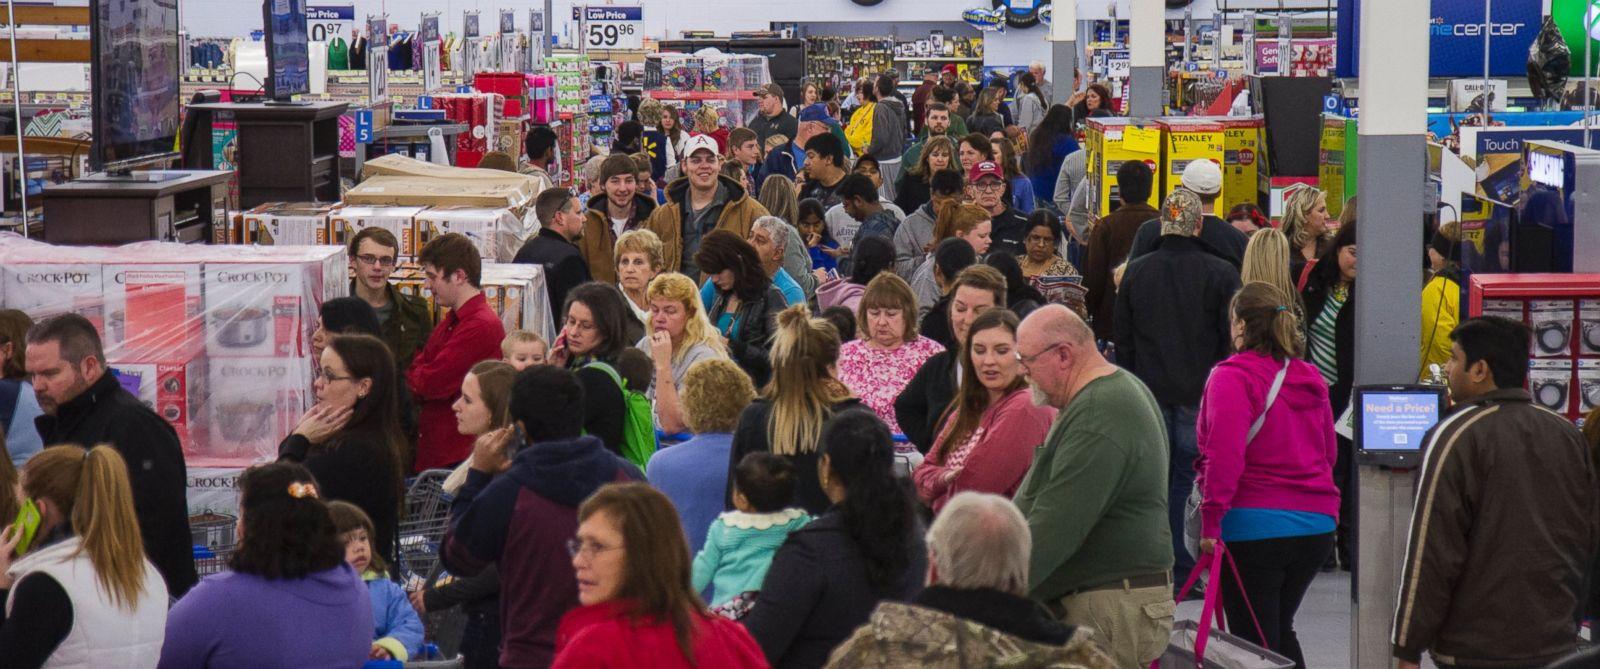 Black Friday: Why I Refuse to Go Shopping - ABC News